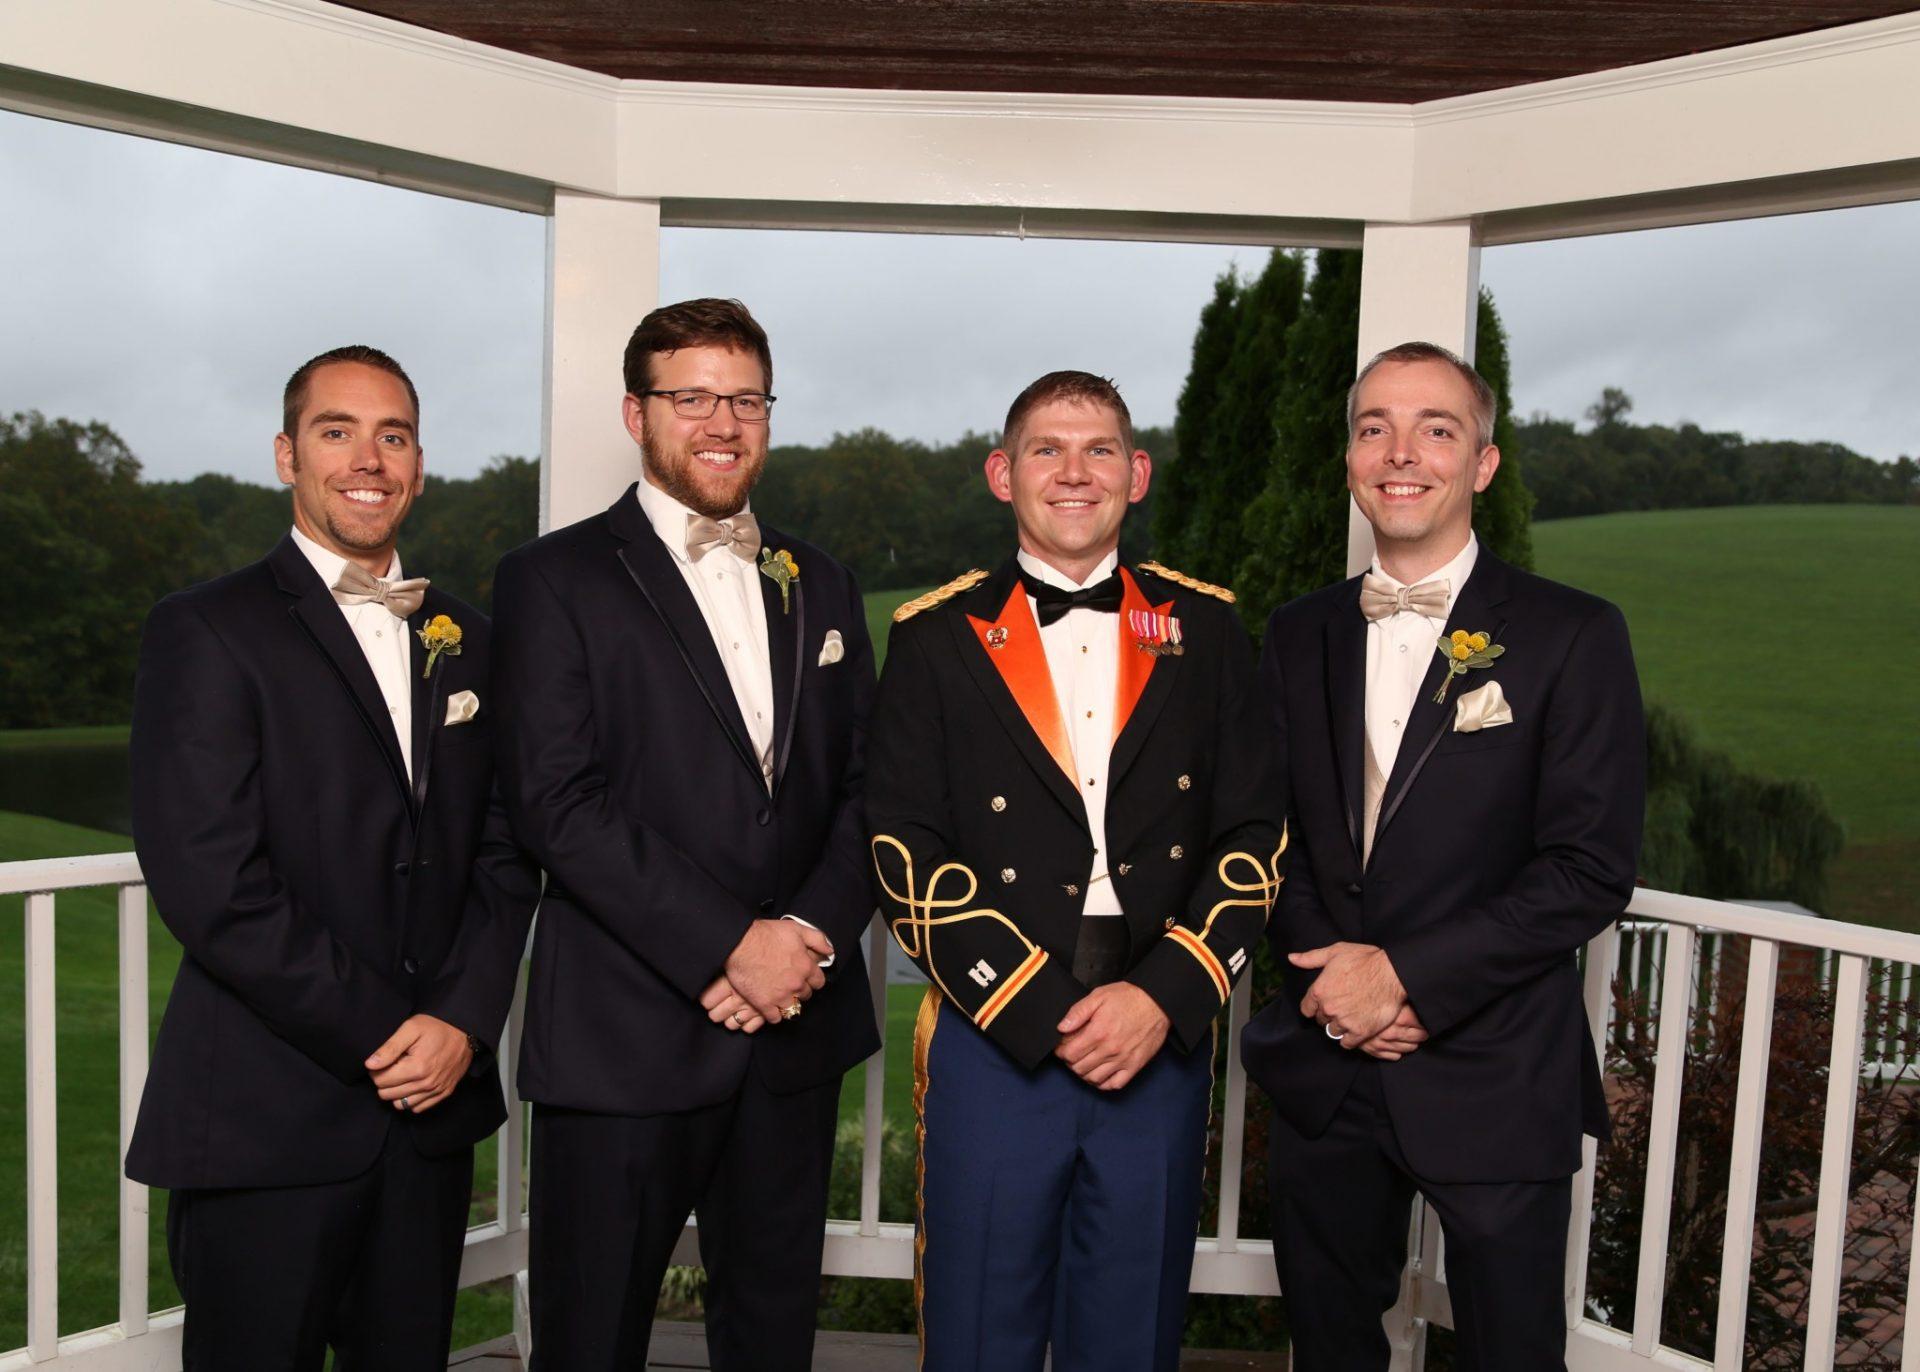 Groom and groomsmen pose on the gazebo at Morningside Inn before their wedding in Md